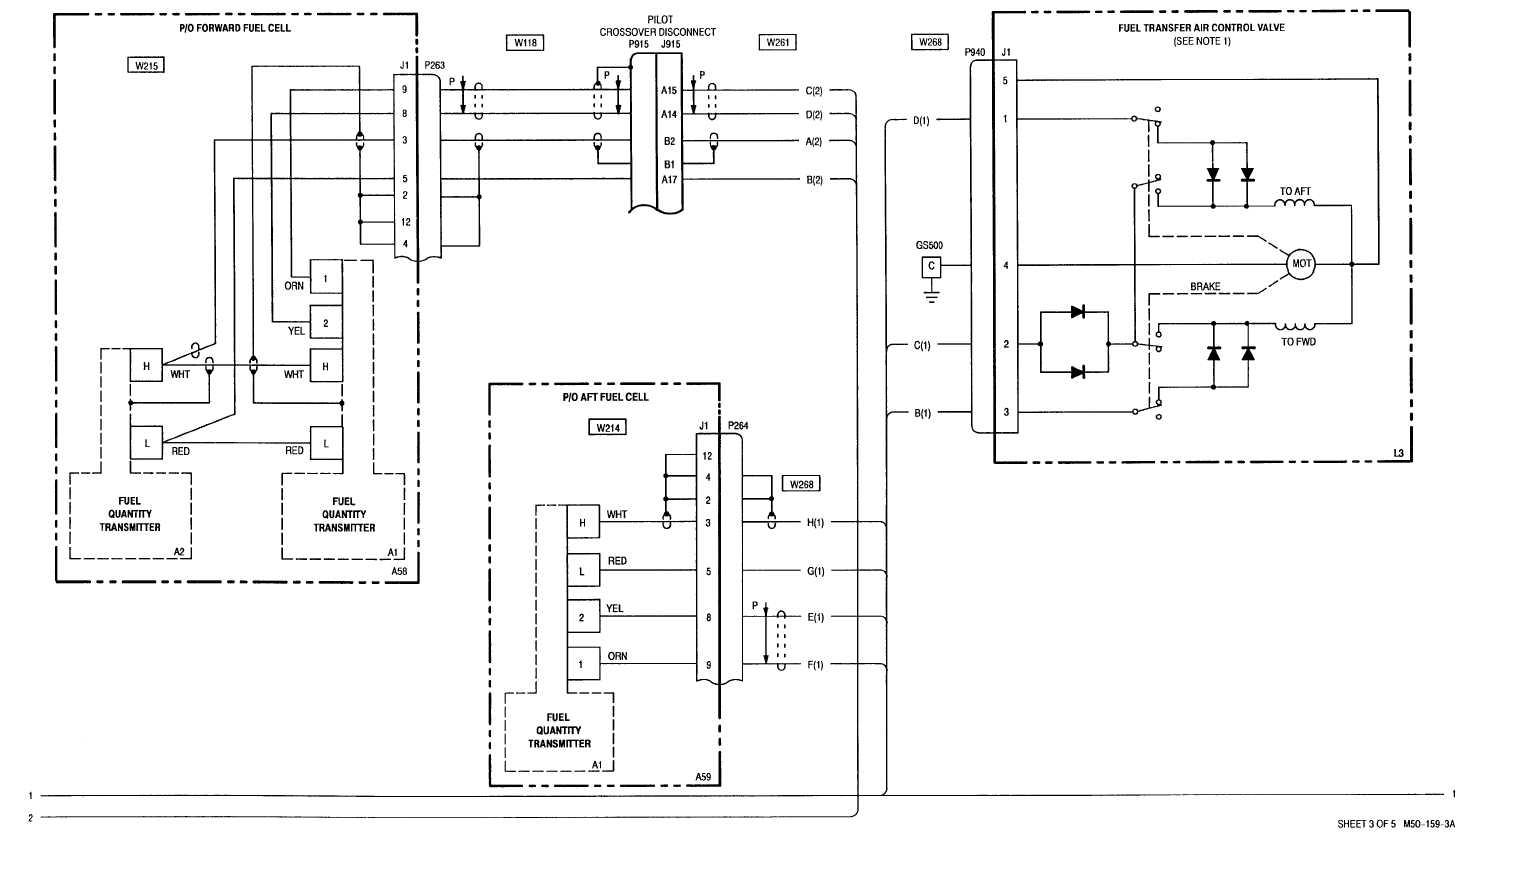 13 3 Fuel Quantity Indication Transfer Wiring Diagram